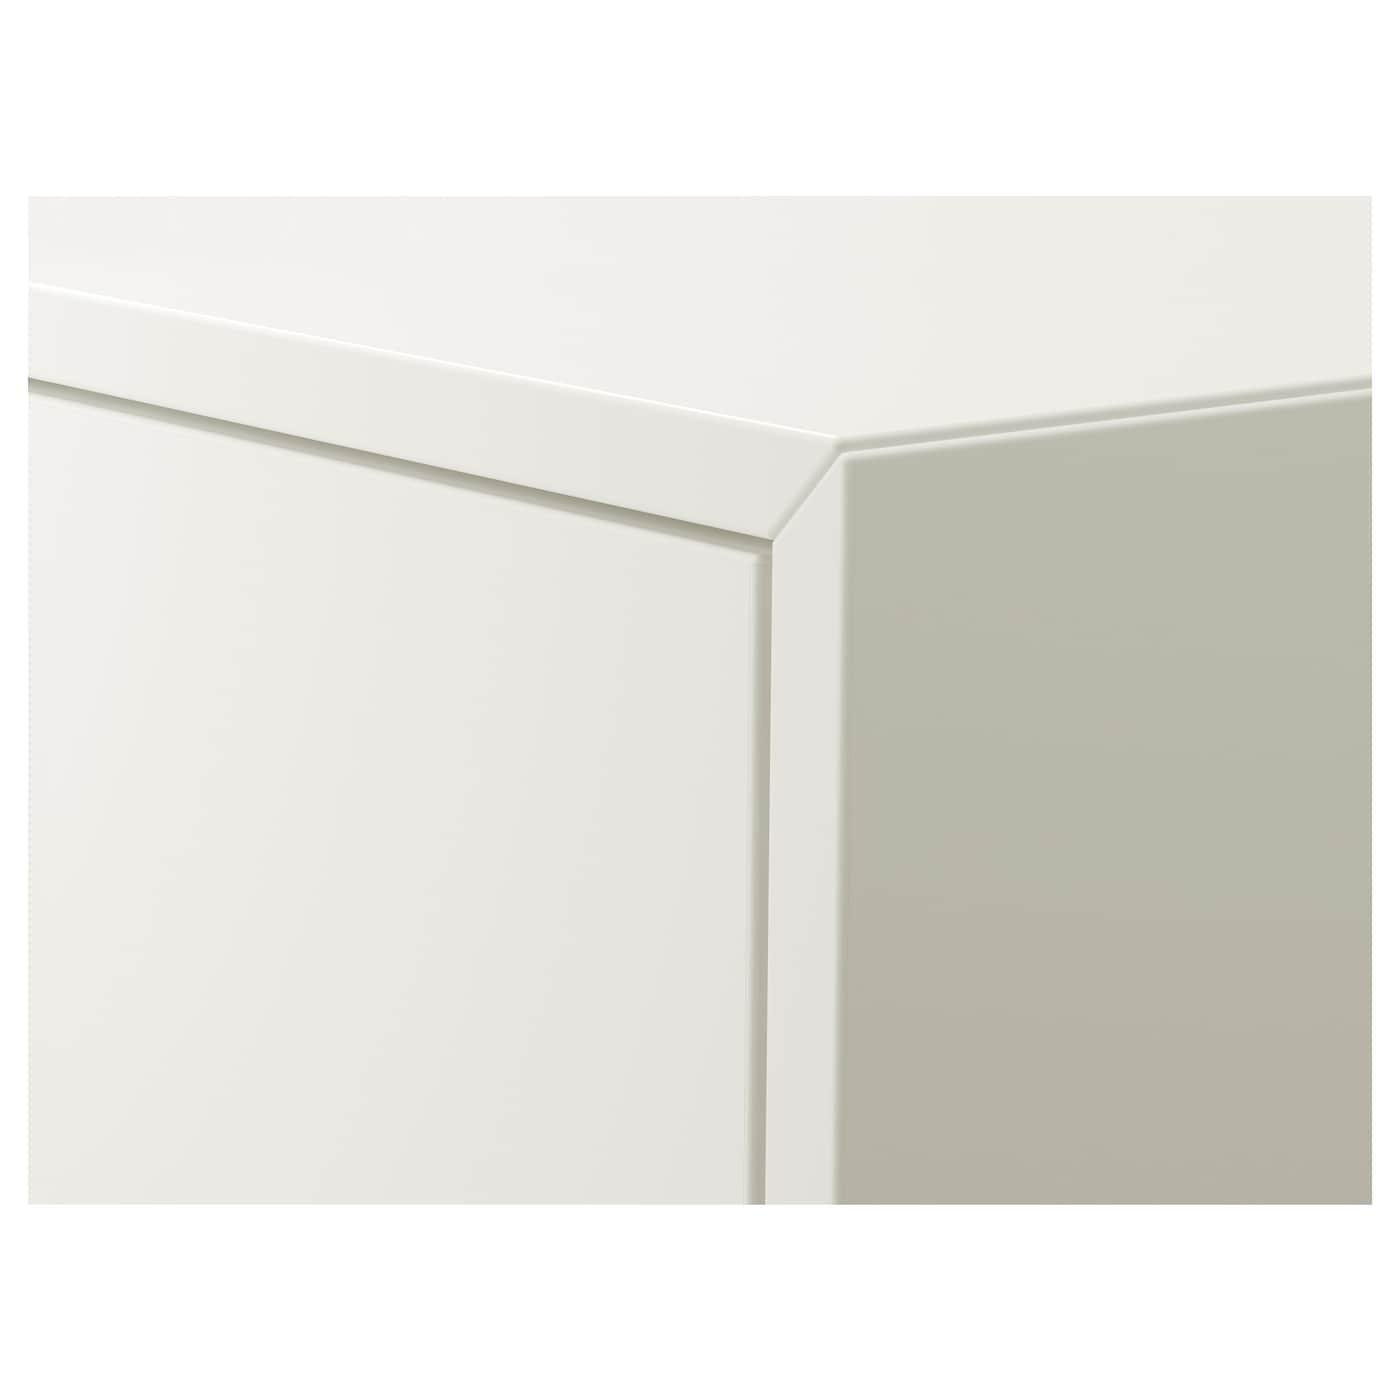 "EKET Wall-mounted cabinet combination, white/dark gray/light gray, 31 1/2x13 3/4x82 5/8 """